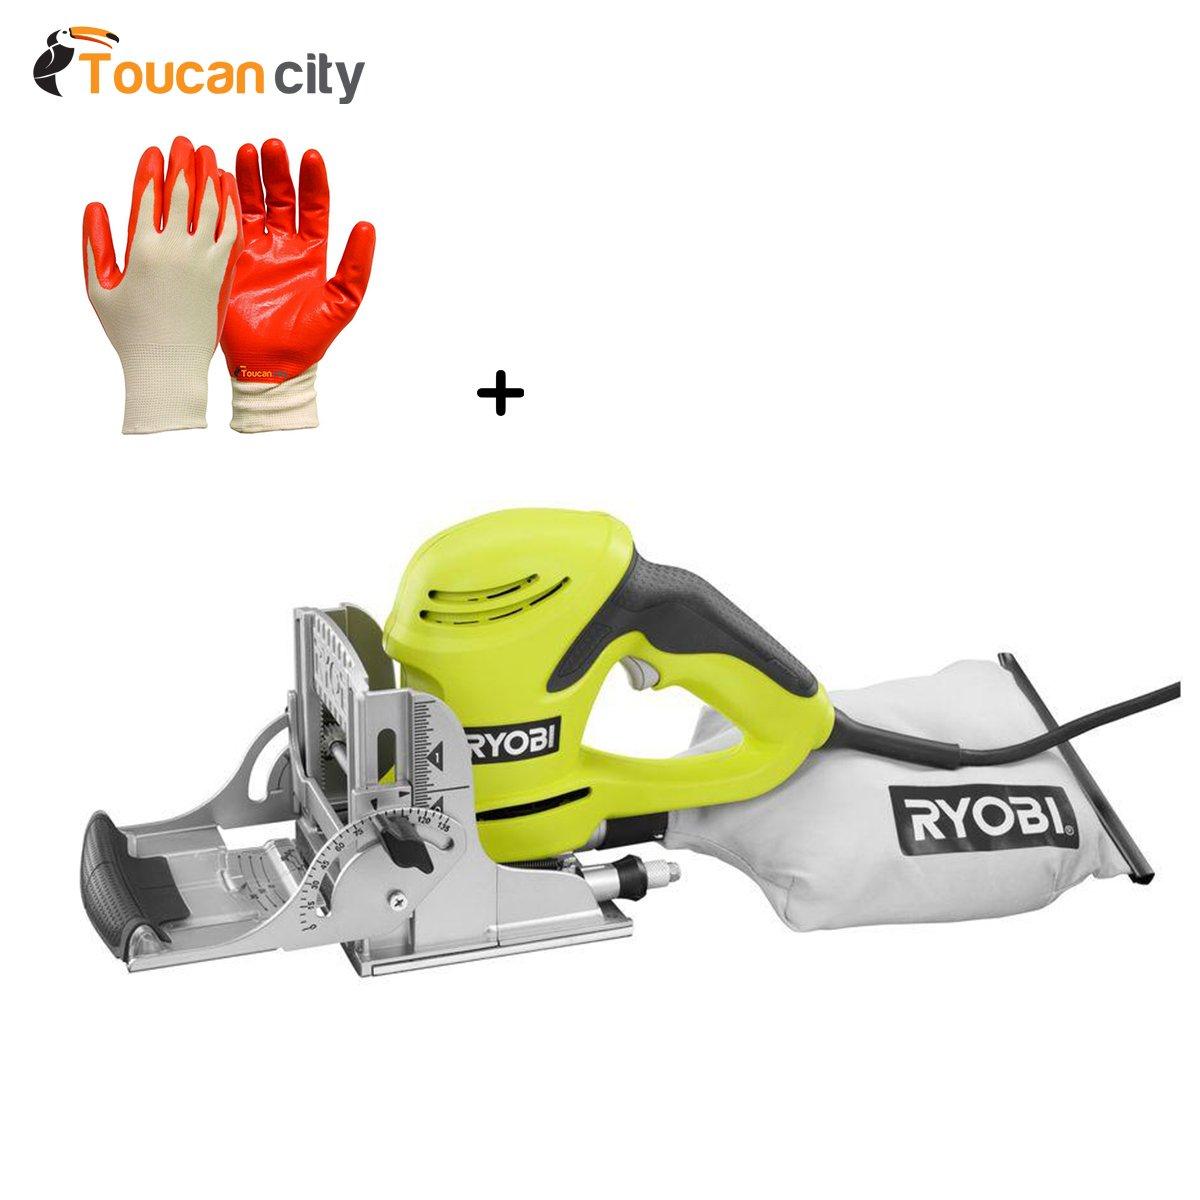 Ryobi 6-Amp Biscuit Joiner Kit JM82GK and Toucan City Nitrile Dip Gloves(5-Pack)